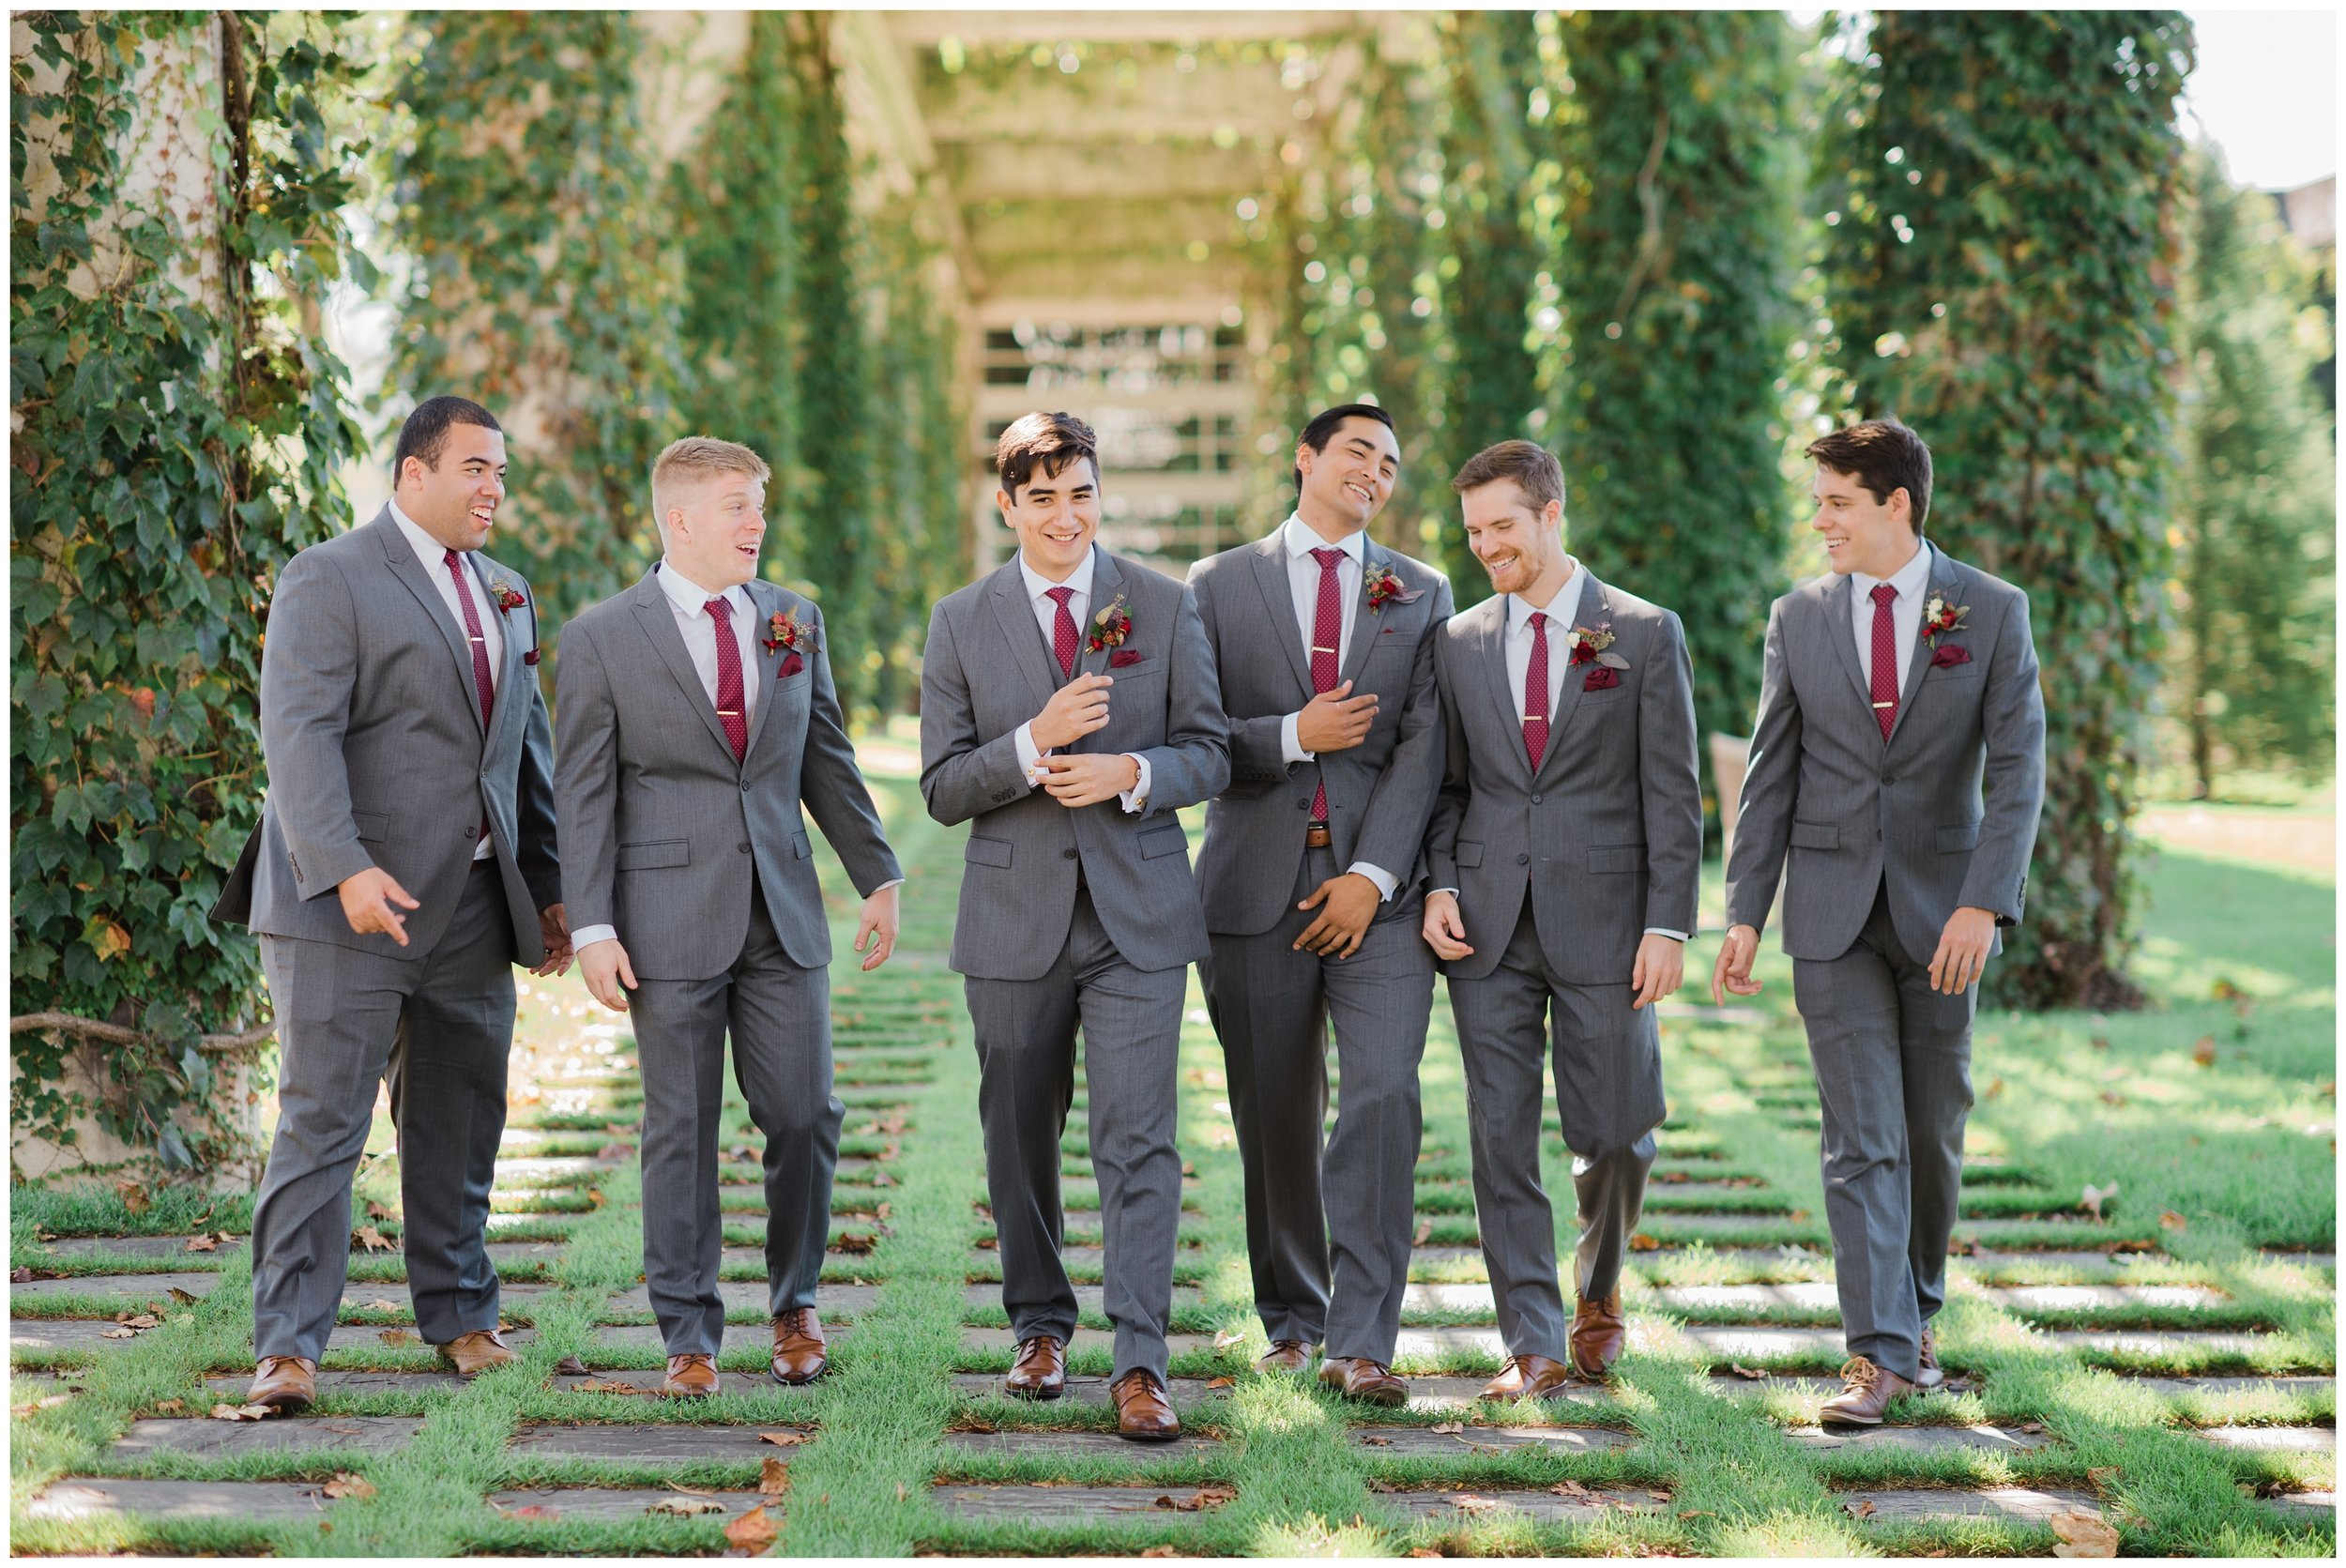 Rebecca_Shehorn_Photography_Indianapolis_Wedding_Photographer_7331.jpg